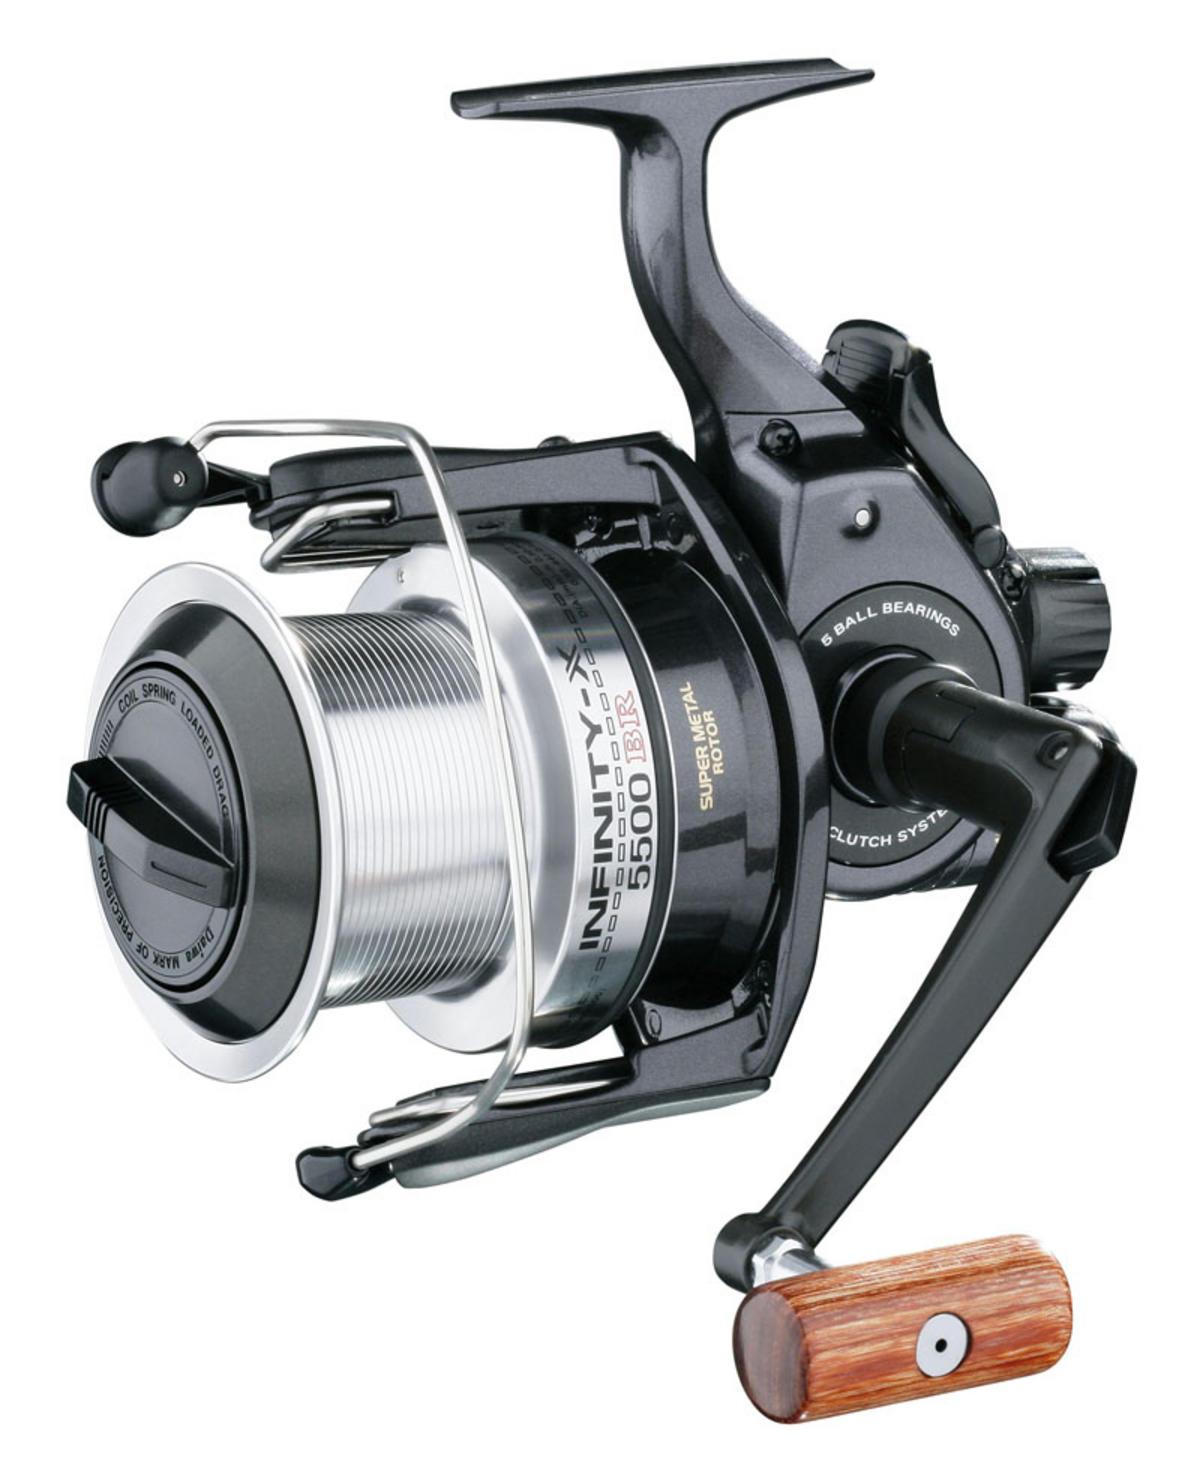 EX DISPLAY DAIWA INFINITY X 5000 BITE 'N' RUN Model No IFX5000BR FISHING REEL